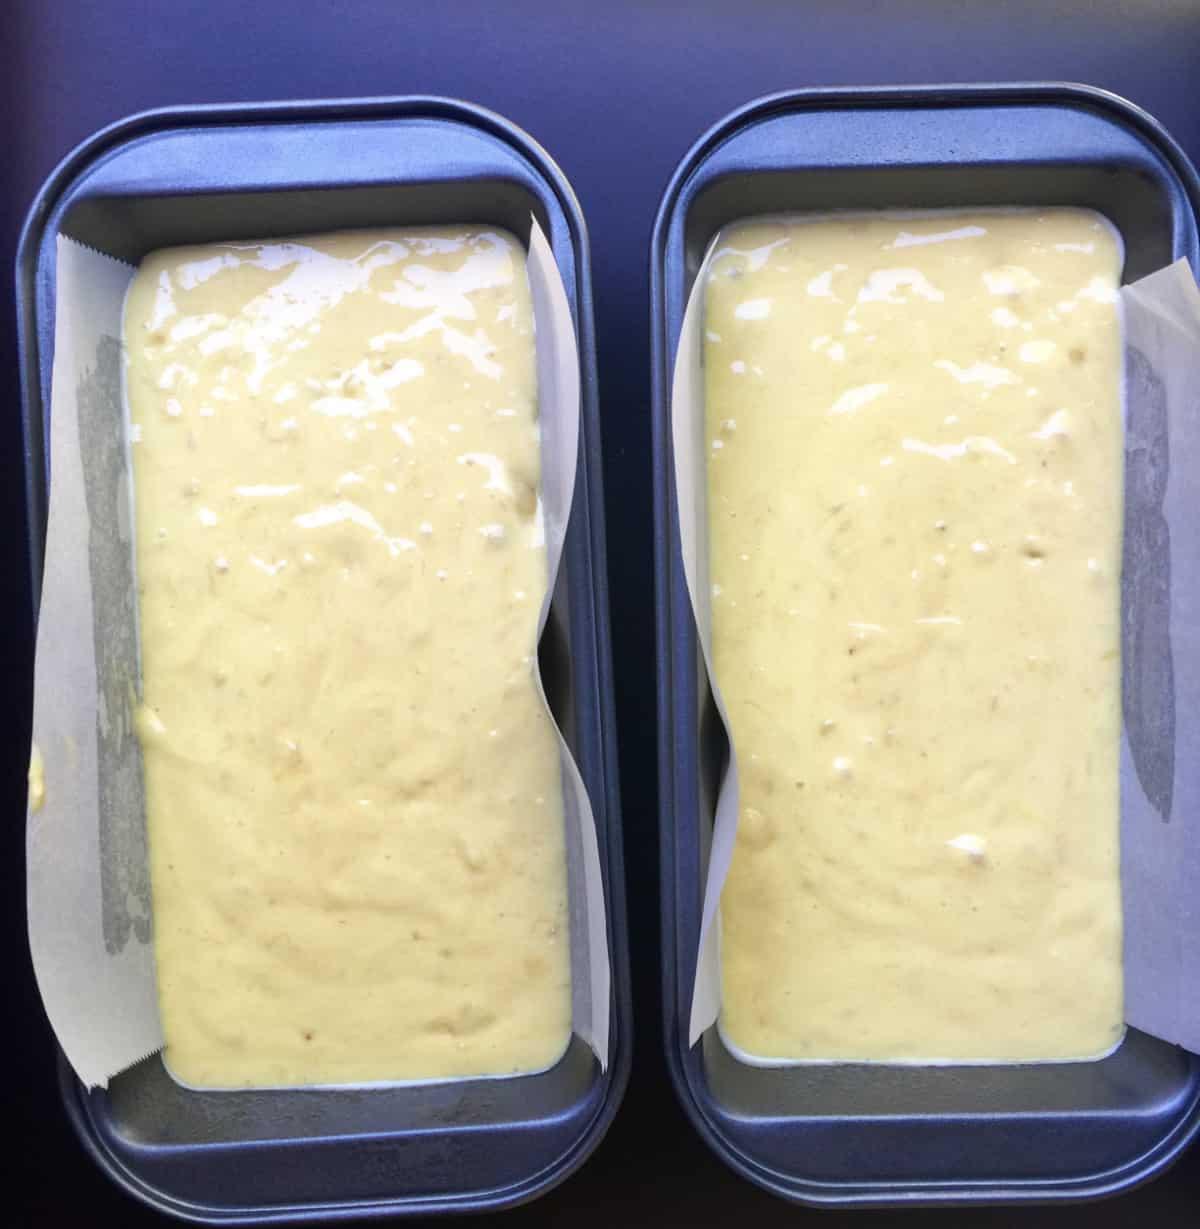 Banana bread batter in two loaf pans.